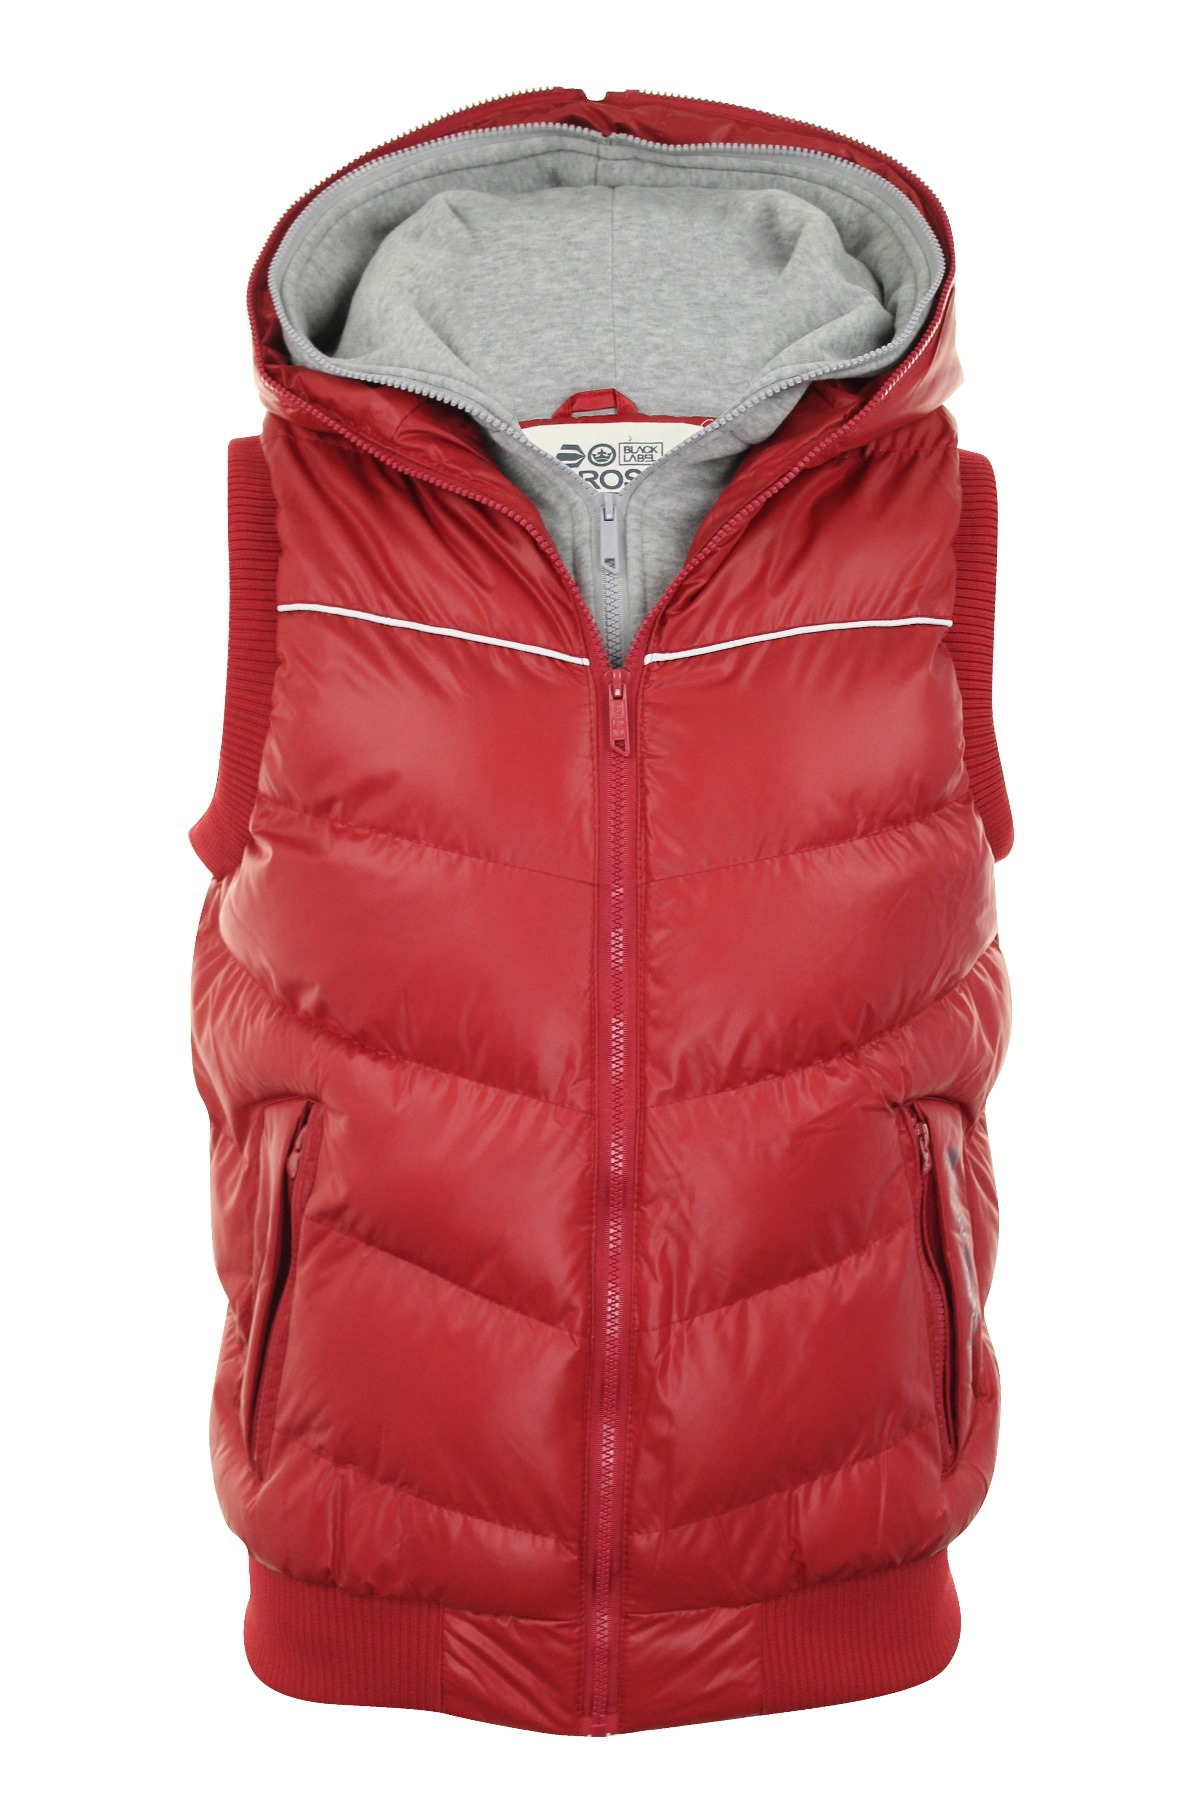 mens gilet body warmer crosshatch 39 gregour 39 zip hoodie. Black Bedroom Furniture Sets. Home Design Ideas